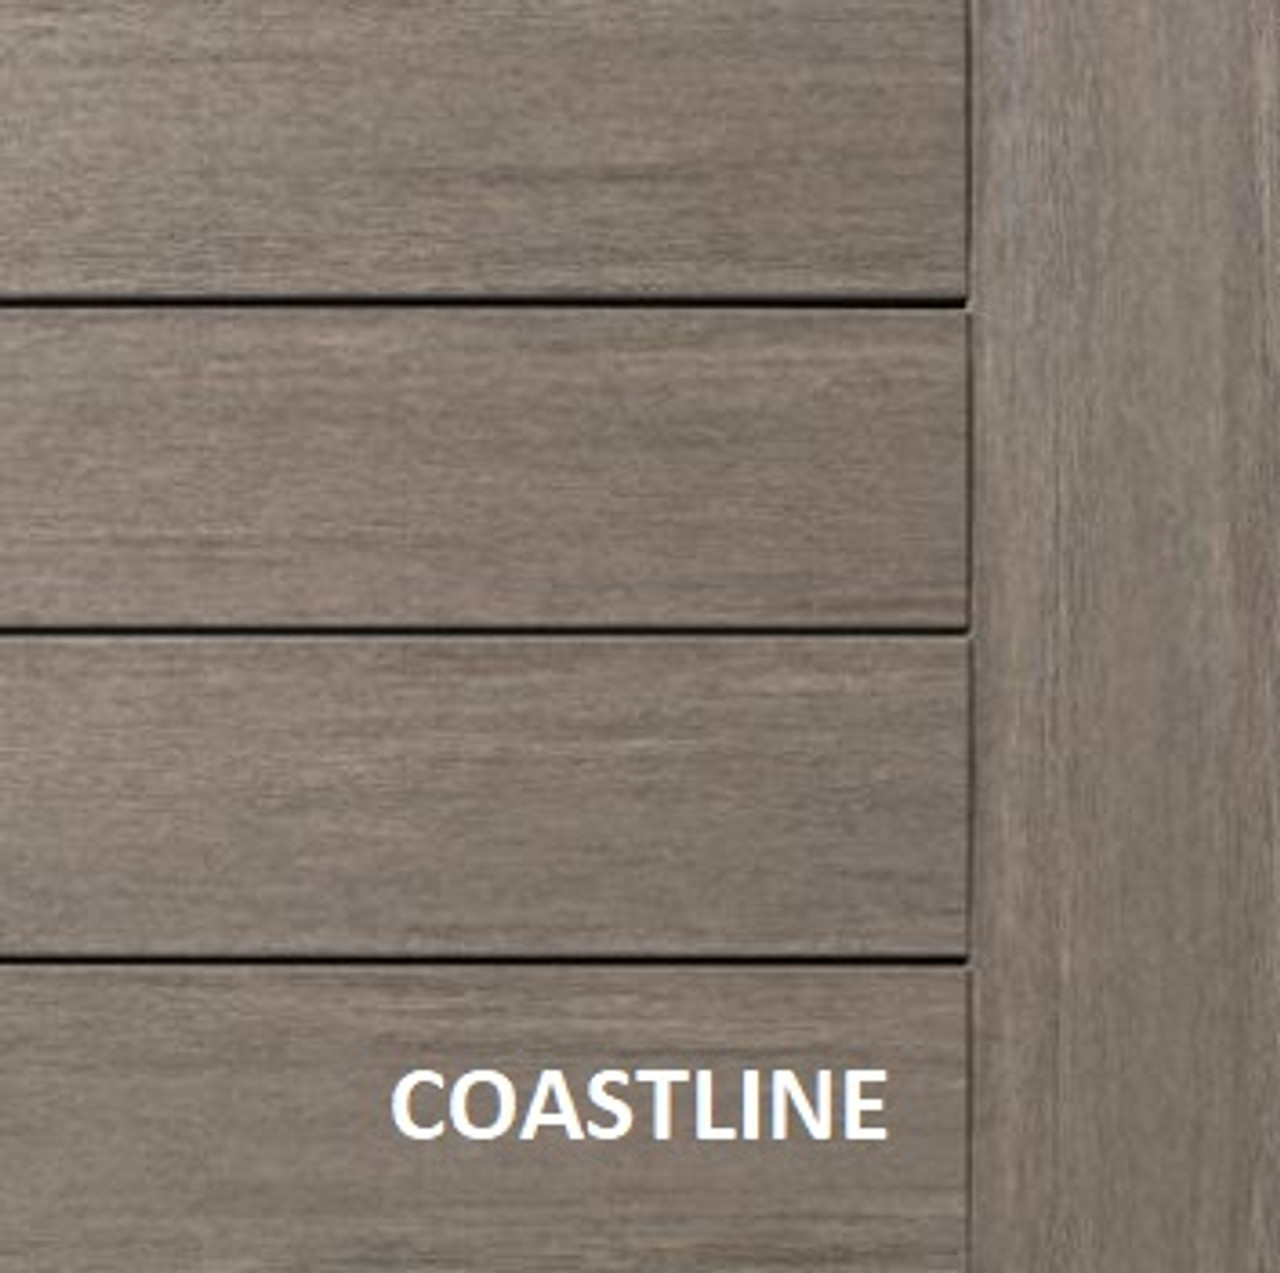 AZEK Vintage Decking Coastline